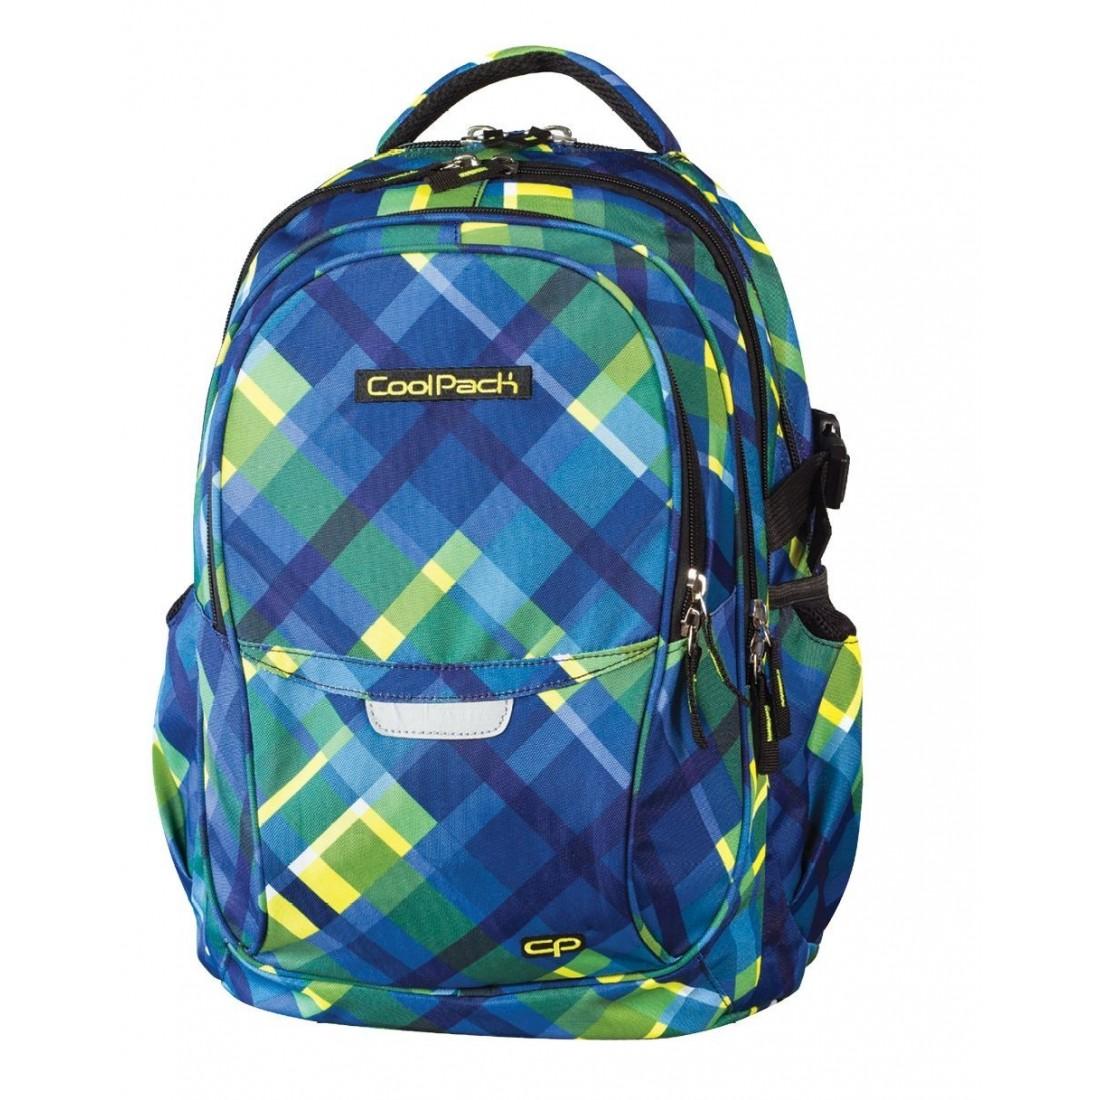 Plecak młodzieżowy CoolPack CP - 4 przegrody FACTOR AZURE CHECK 442 - plecak-tornister.pl